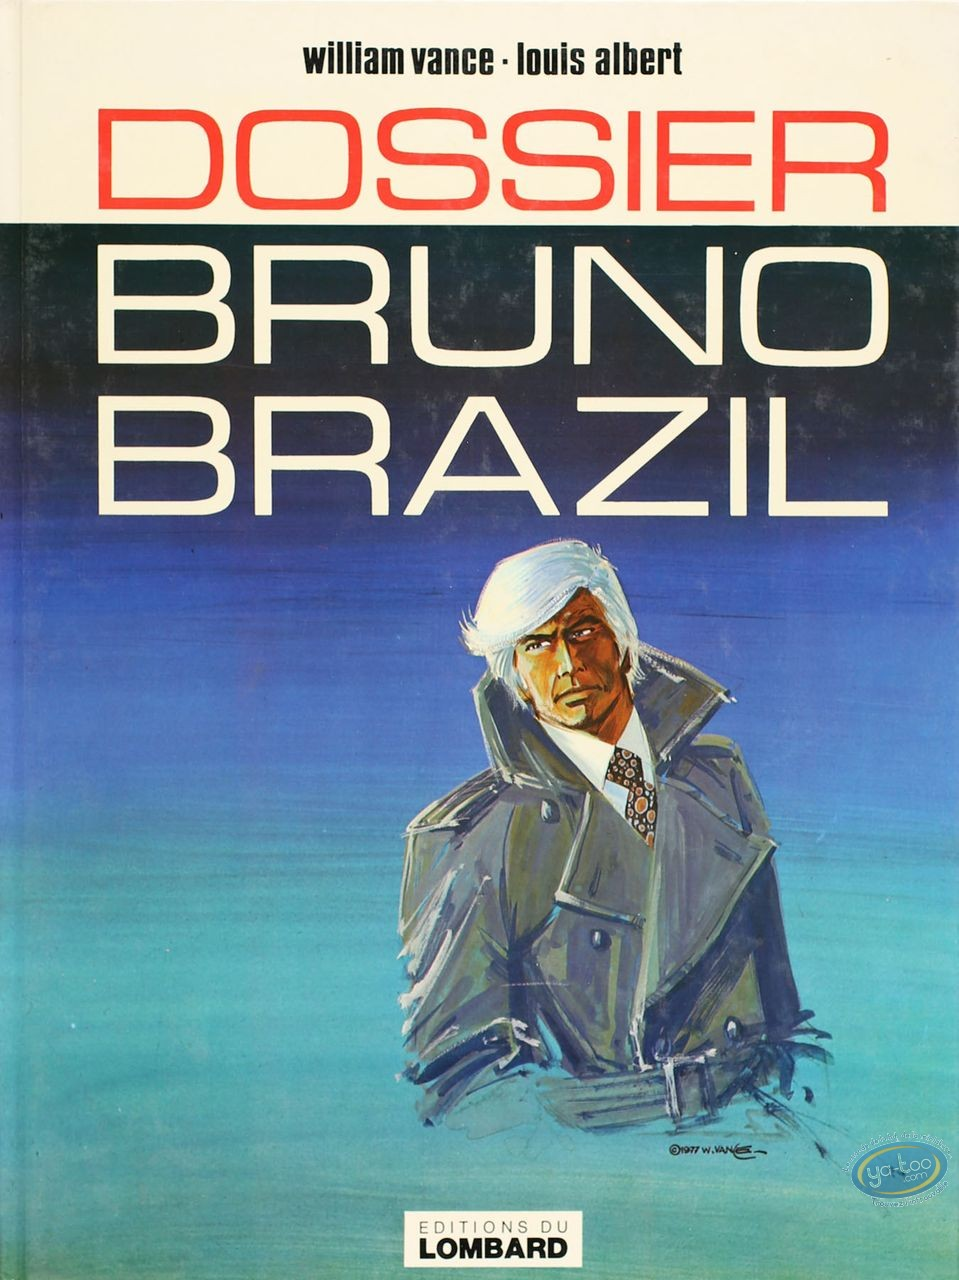 Listed European Comic Books, Bruno Brazil : Dossier Bruno Brazil (very good condition)